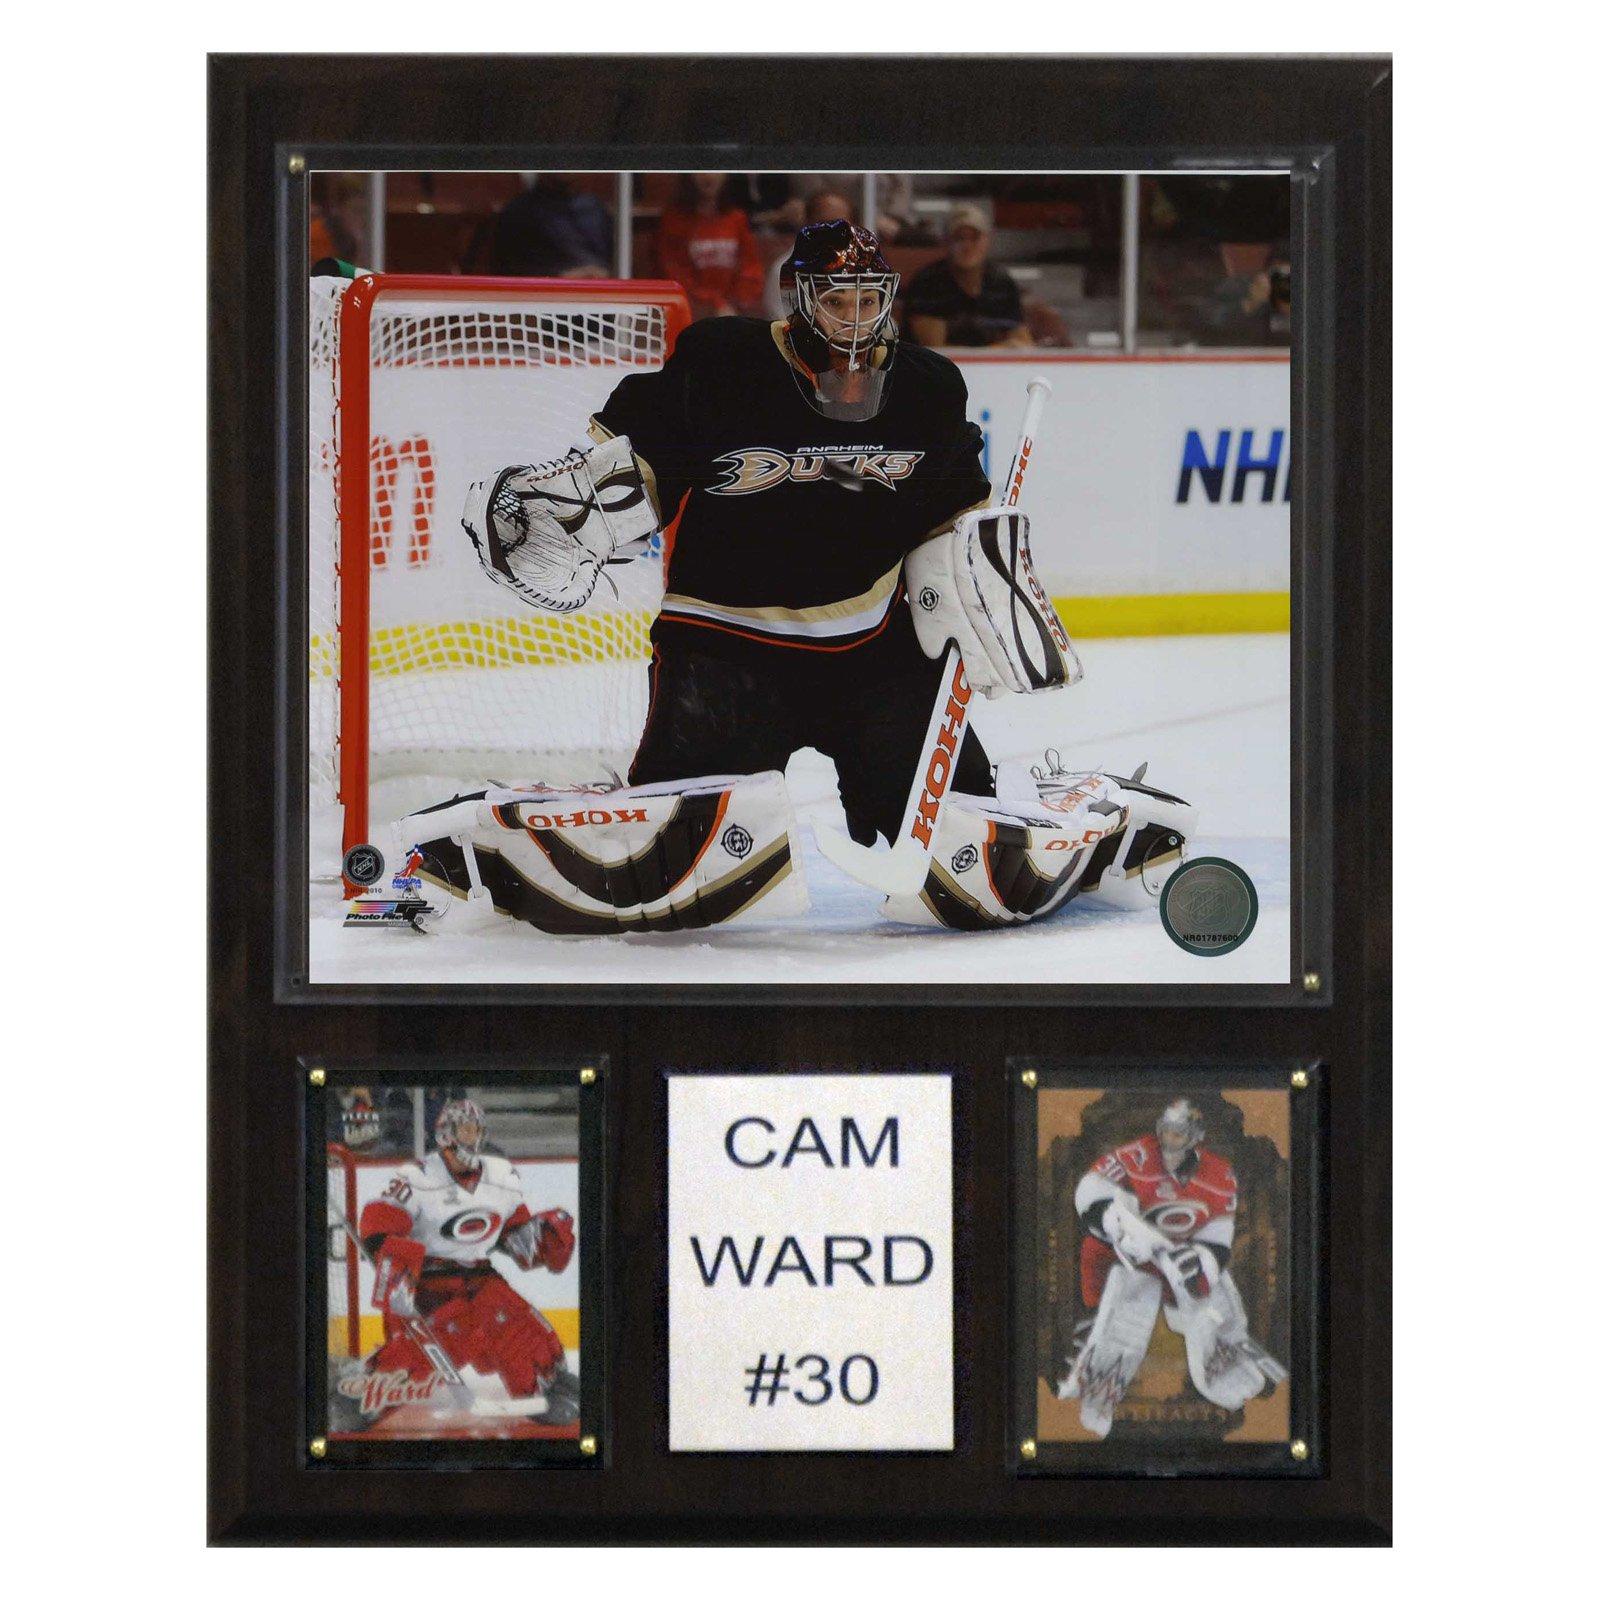 C&I Collectables NHL 12x15 Cam Ward Carolina Hurricanes Player Plaque